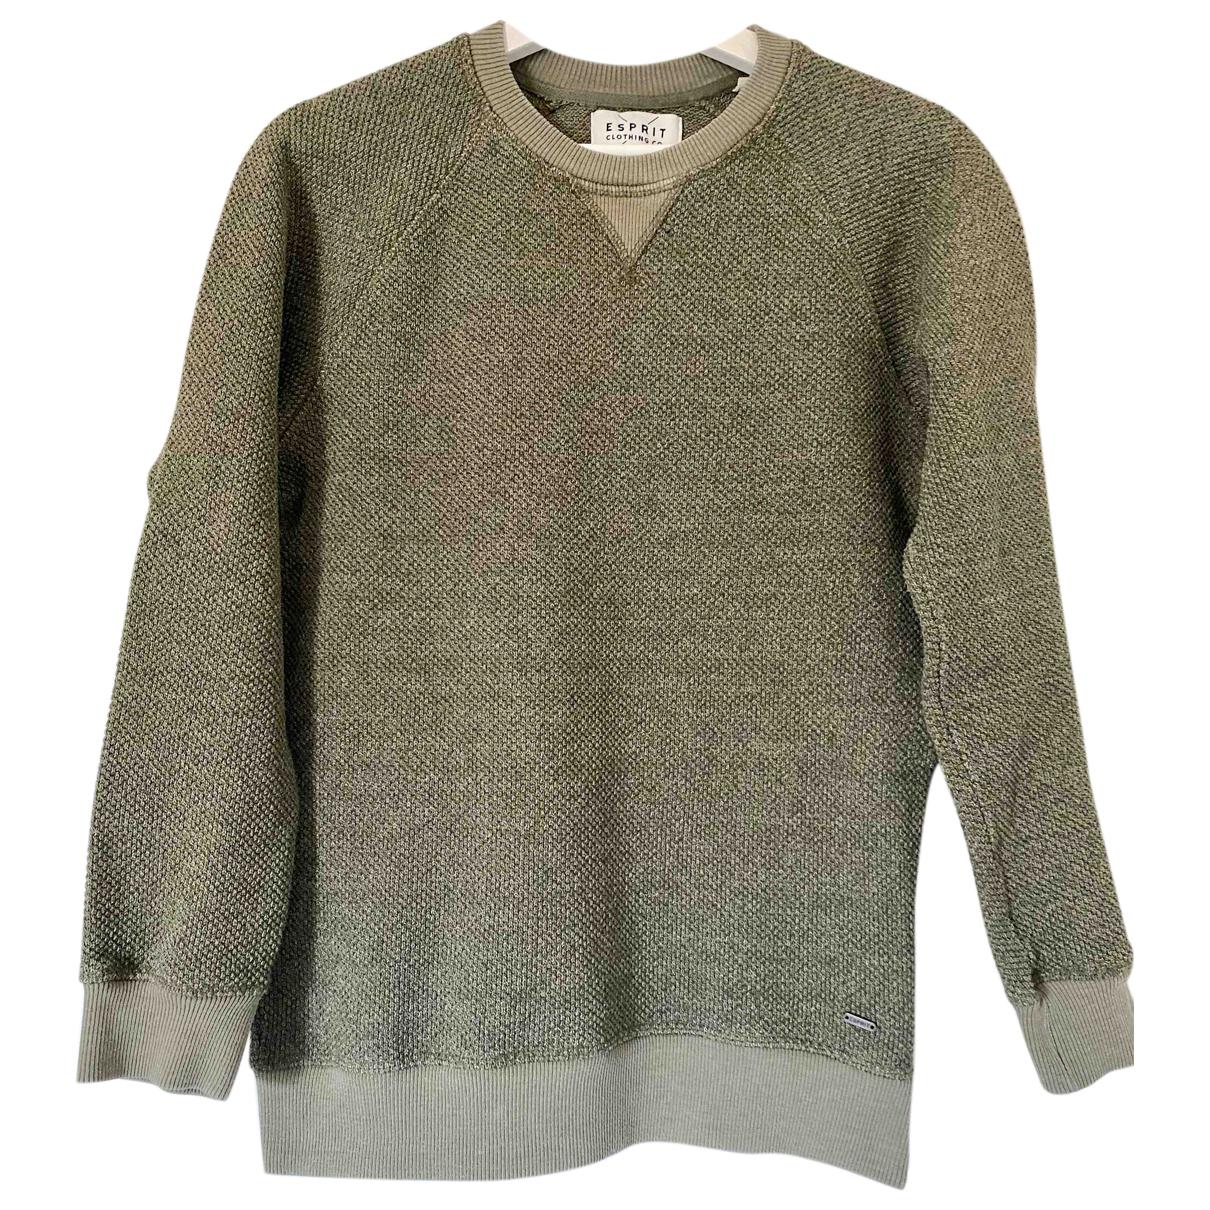 Esprit N Cotton Knitwear for Women M International